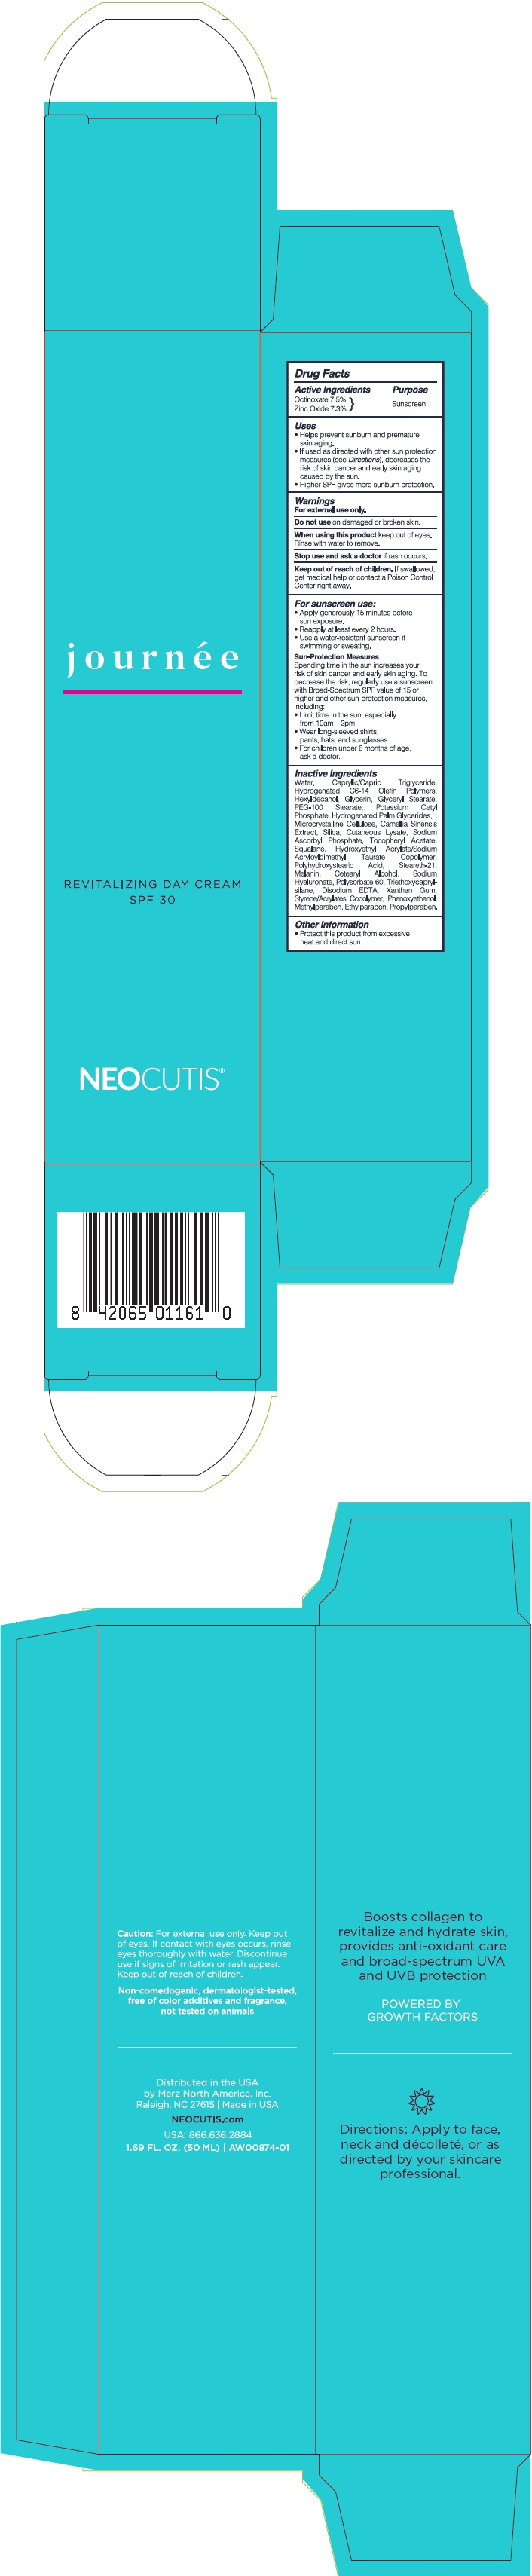 PRINCIPAL DISPLAY PANEL - 50 ML Bottle Carton